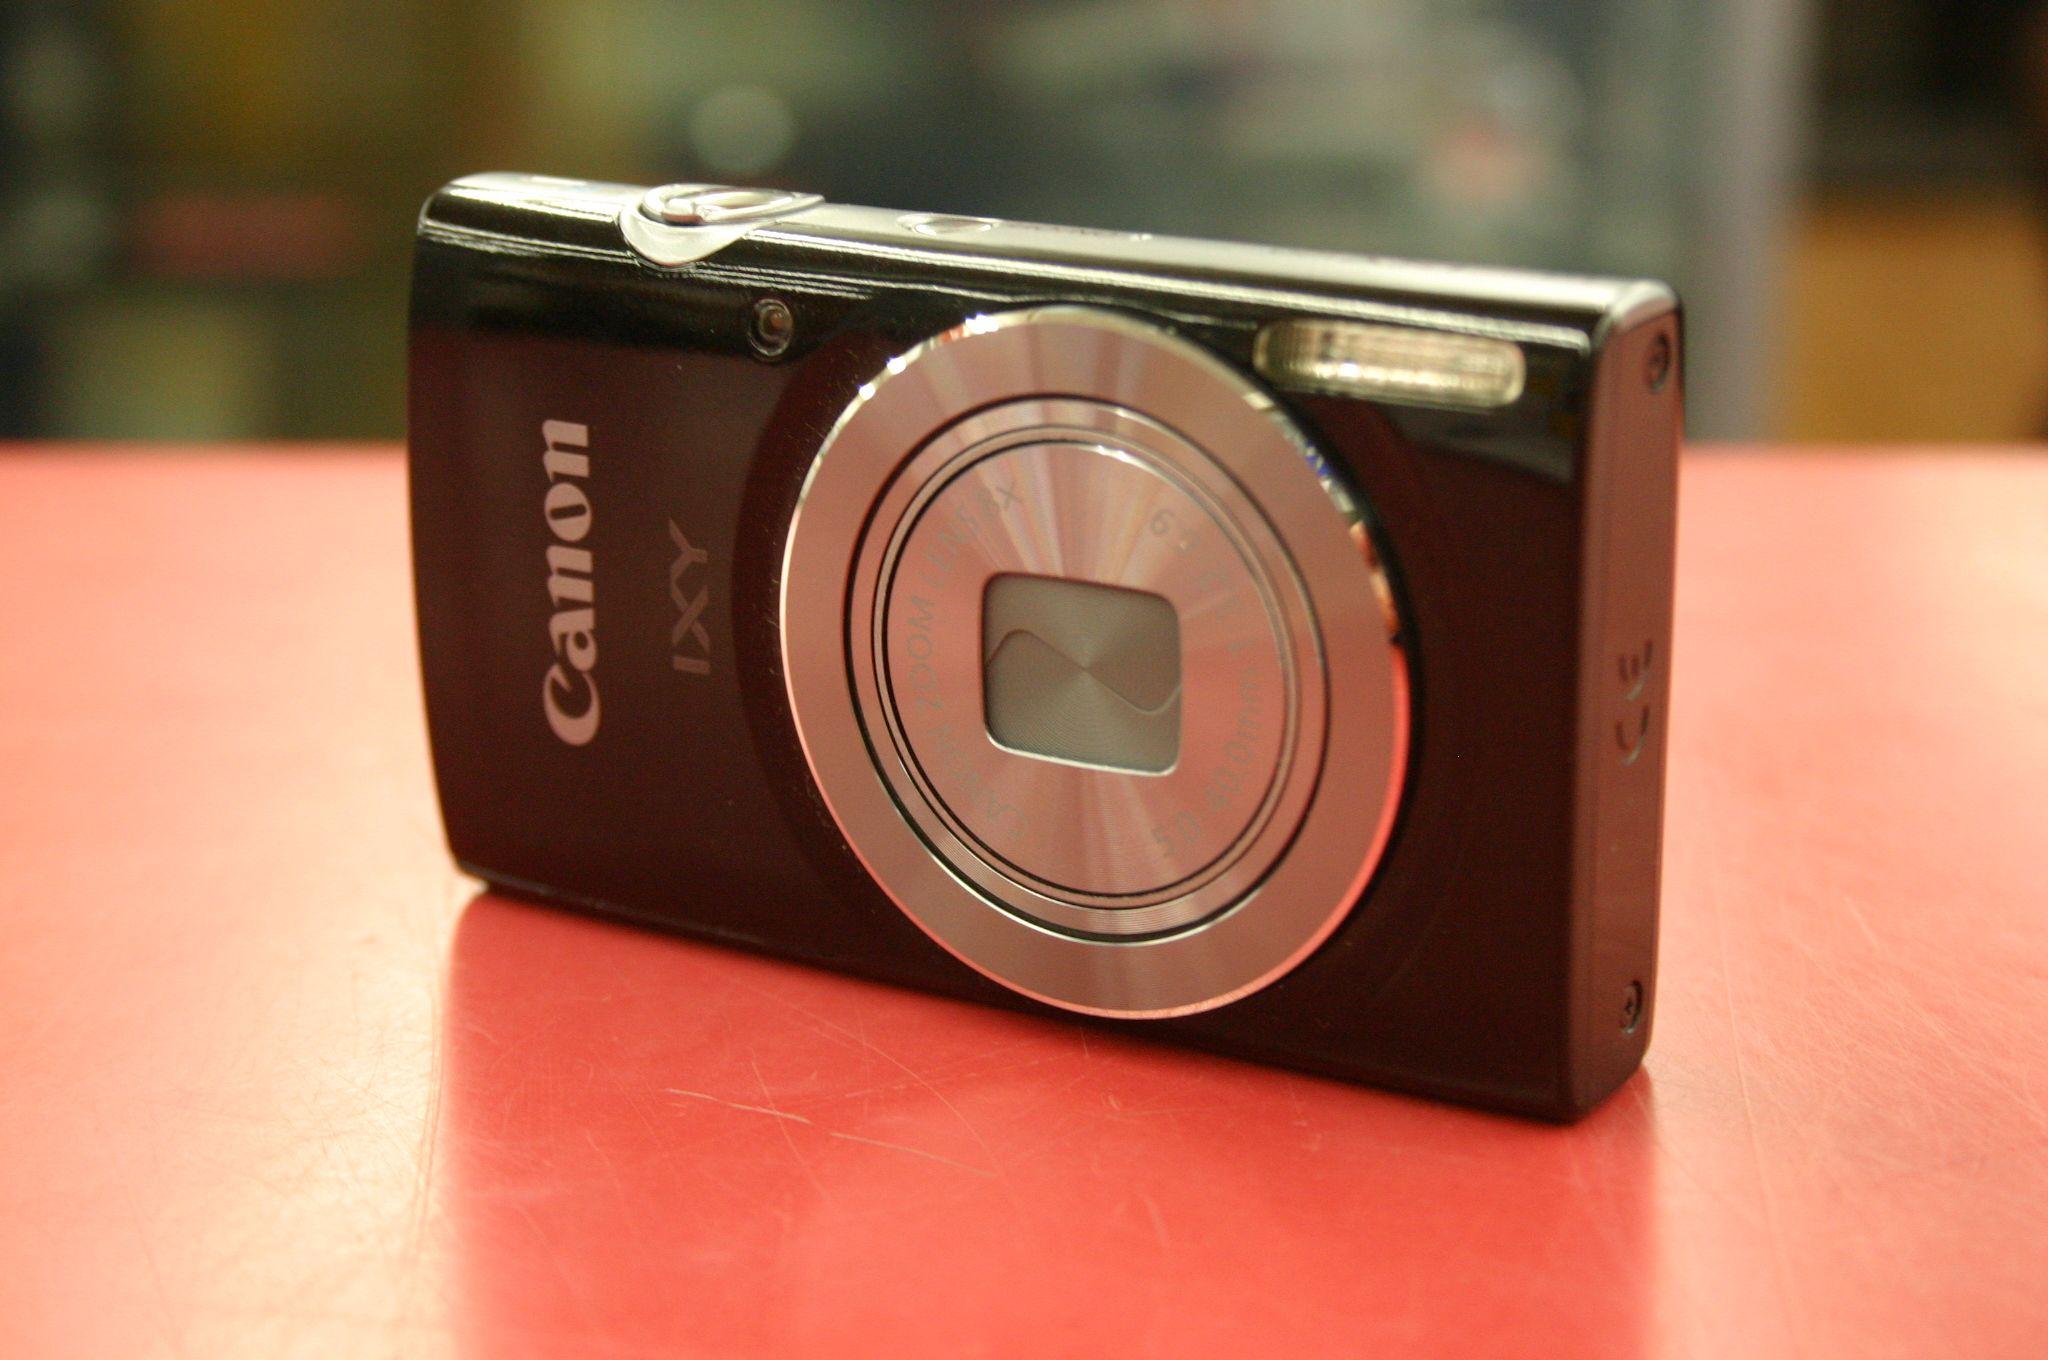 Canonデジタルカメラ買取|名古屋リサイクルショップ ハードオフ豊田上郷